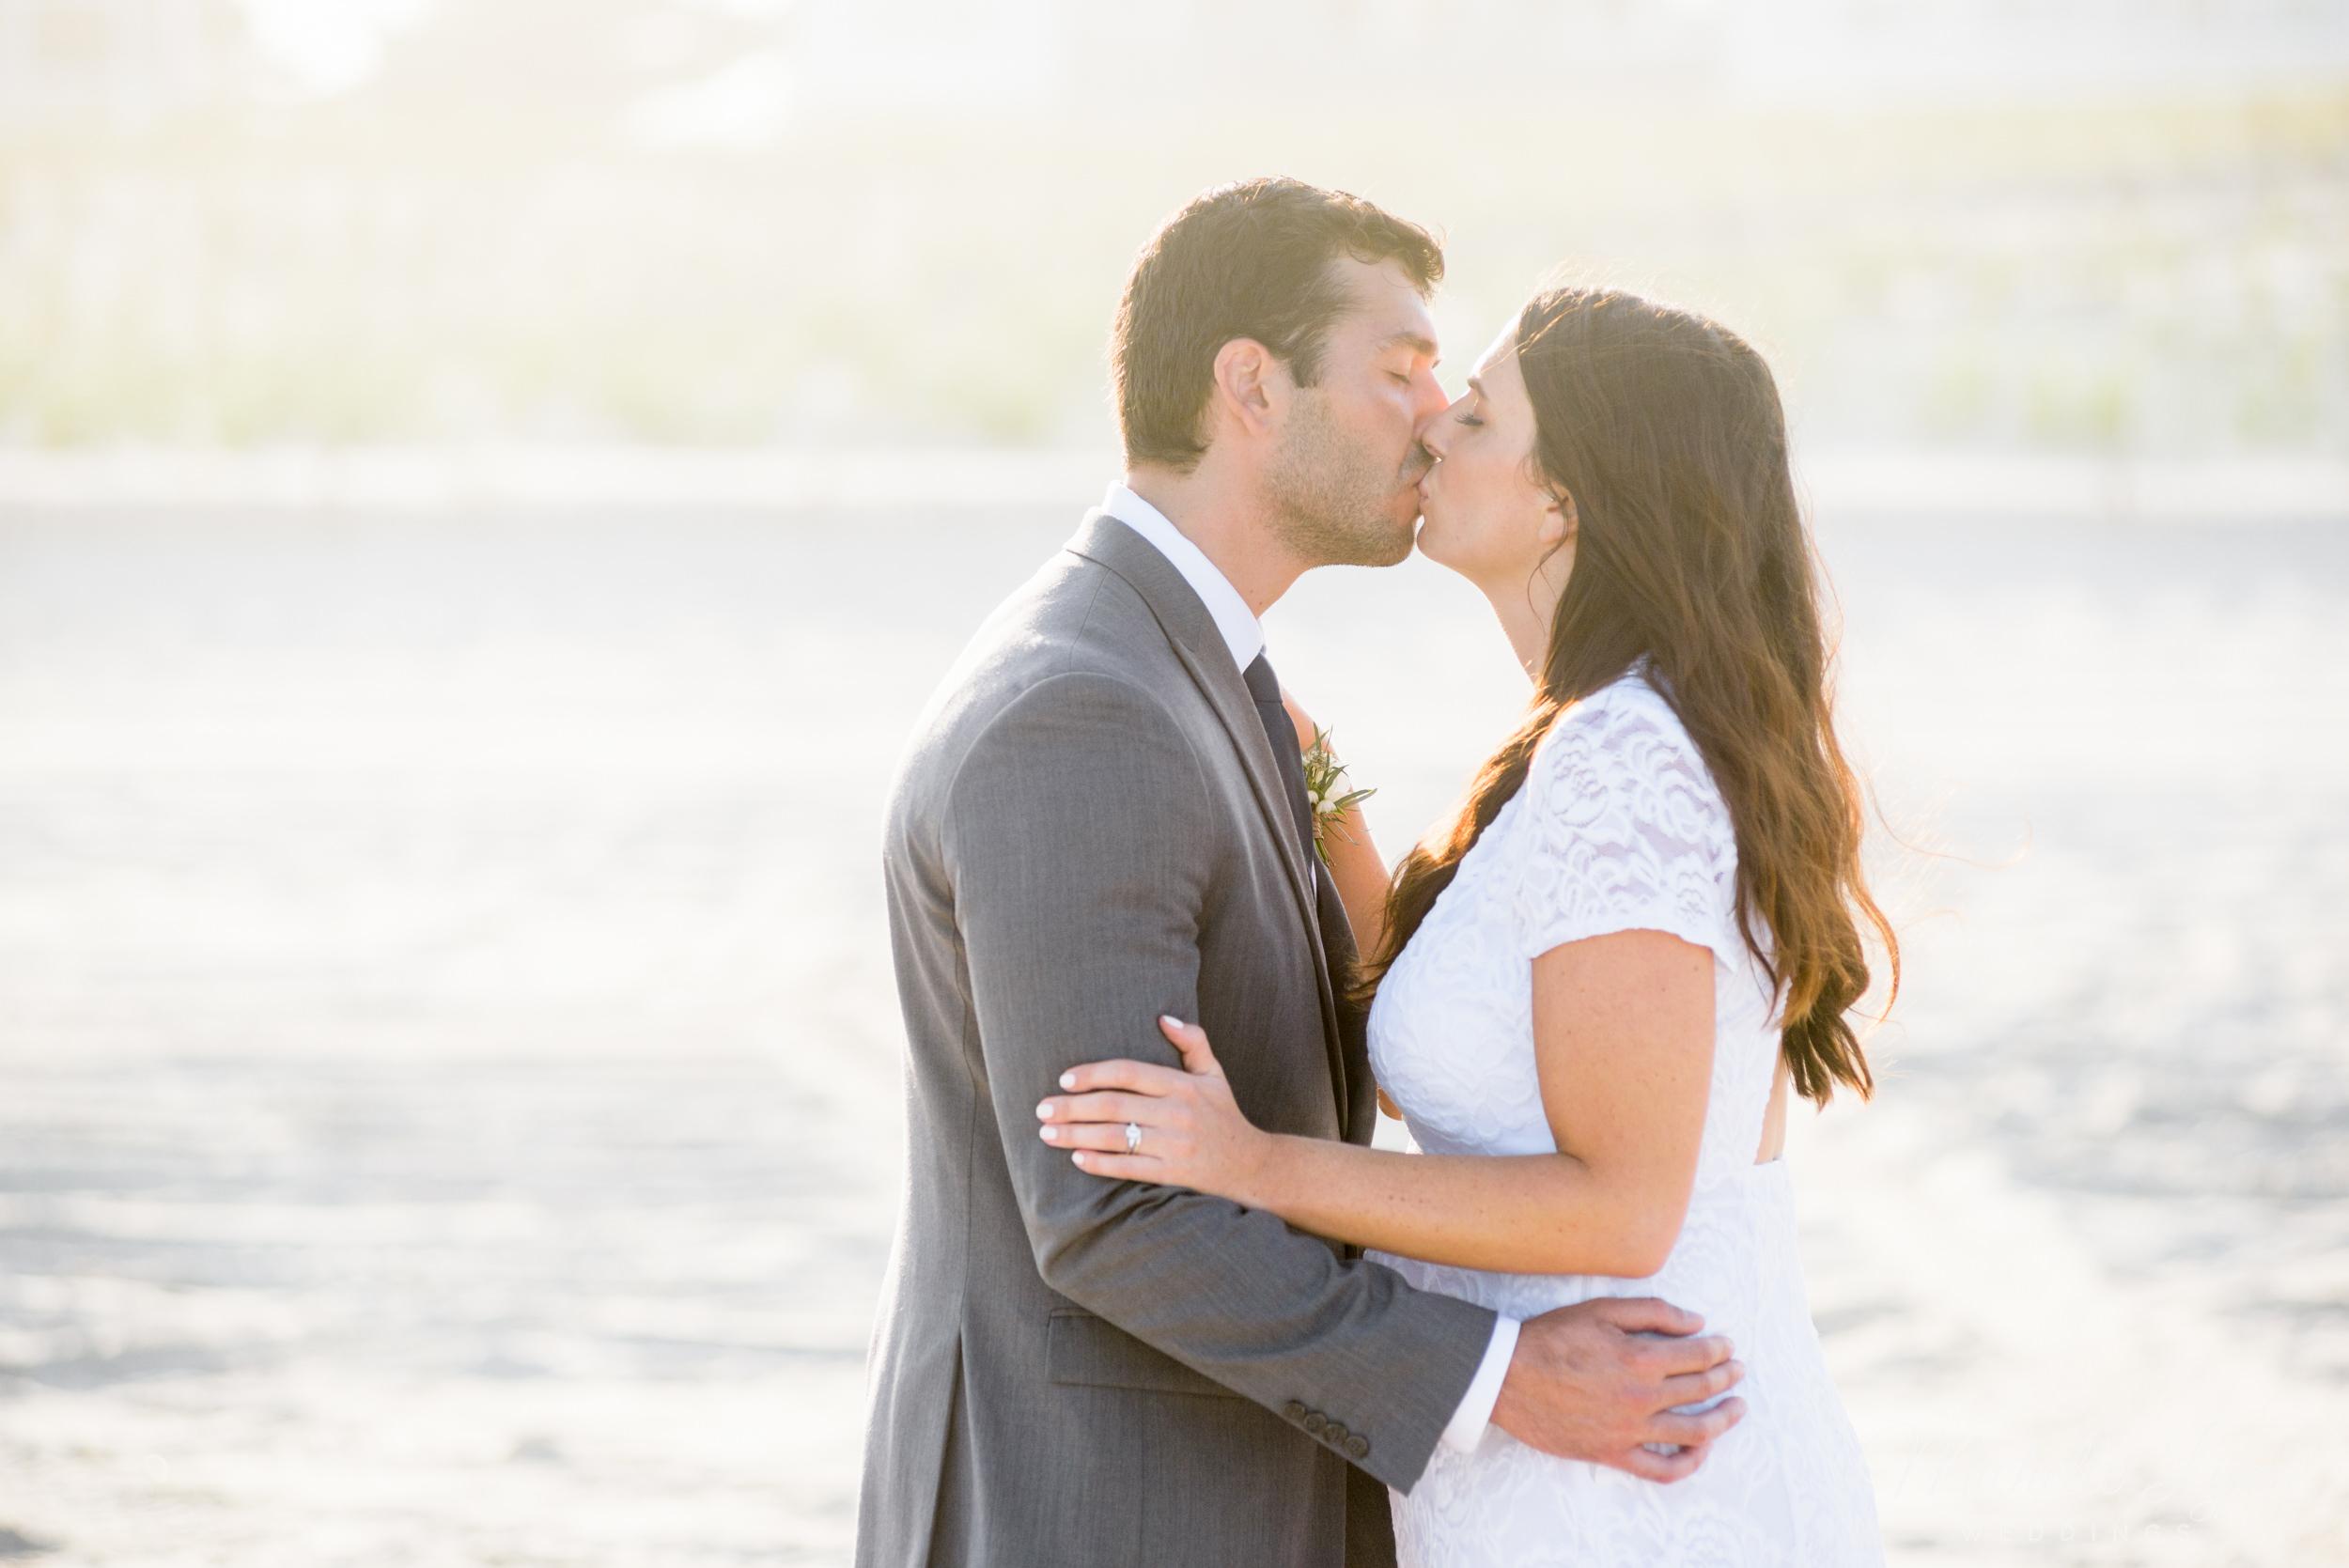 mlw-long-beach-island-new-jersey-wedding-photography-12.jpg